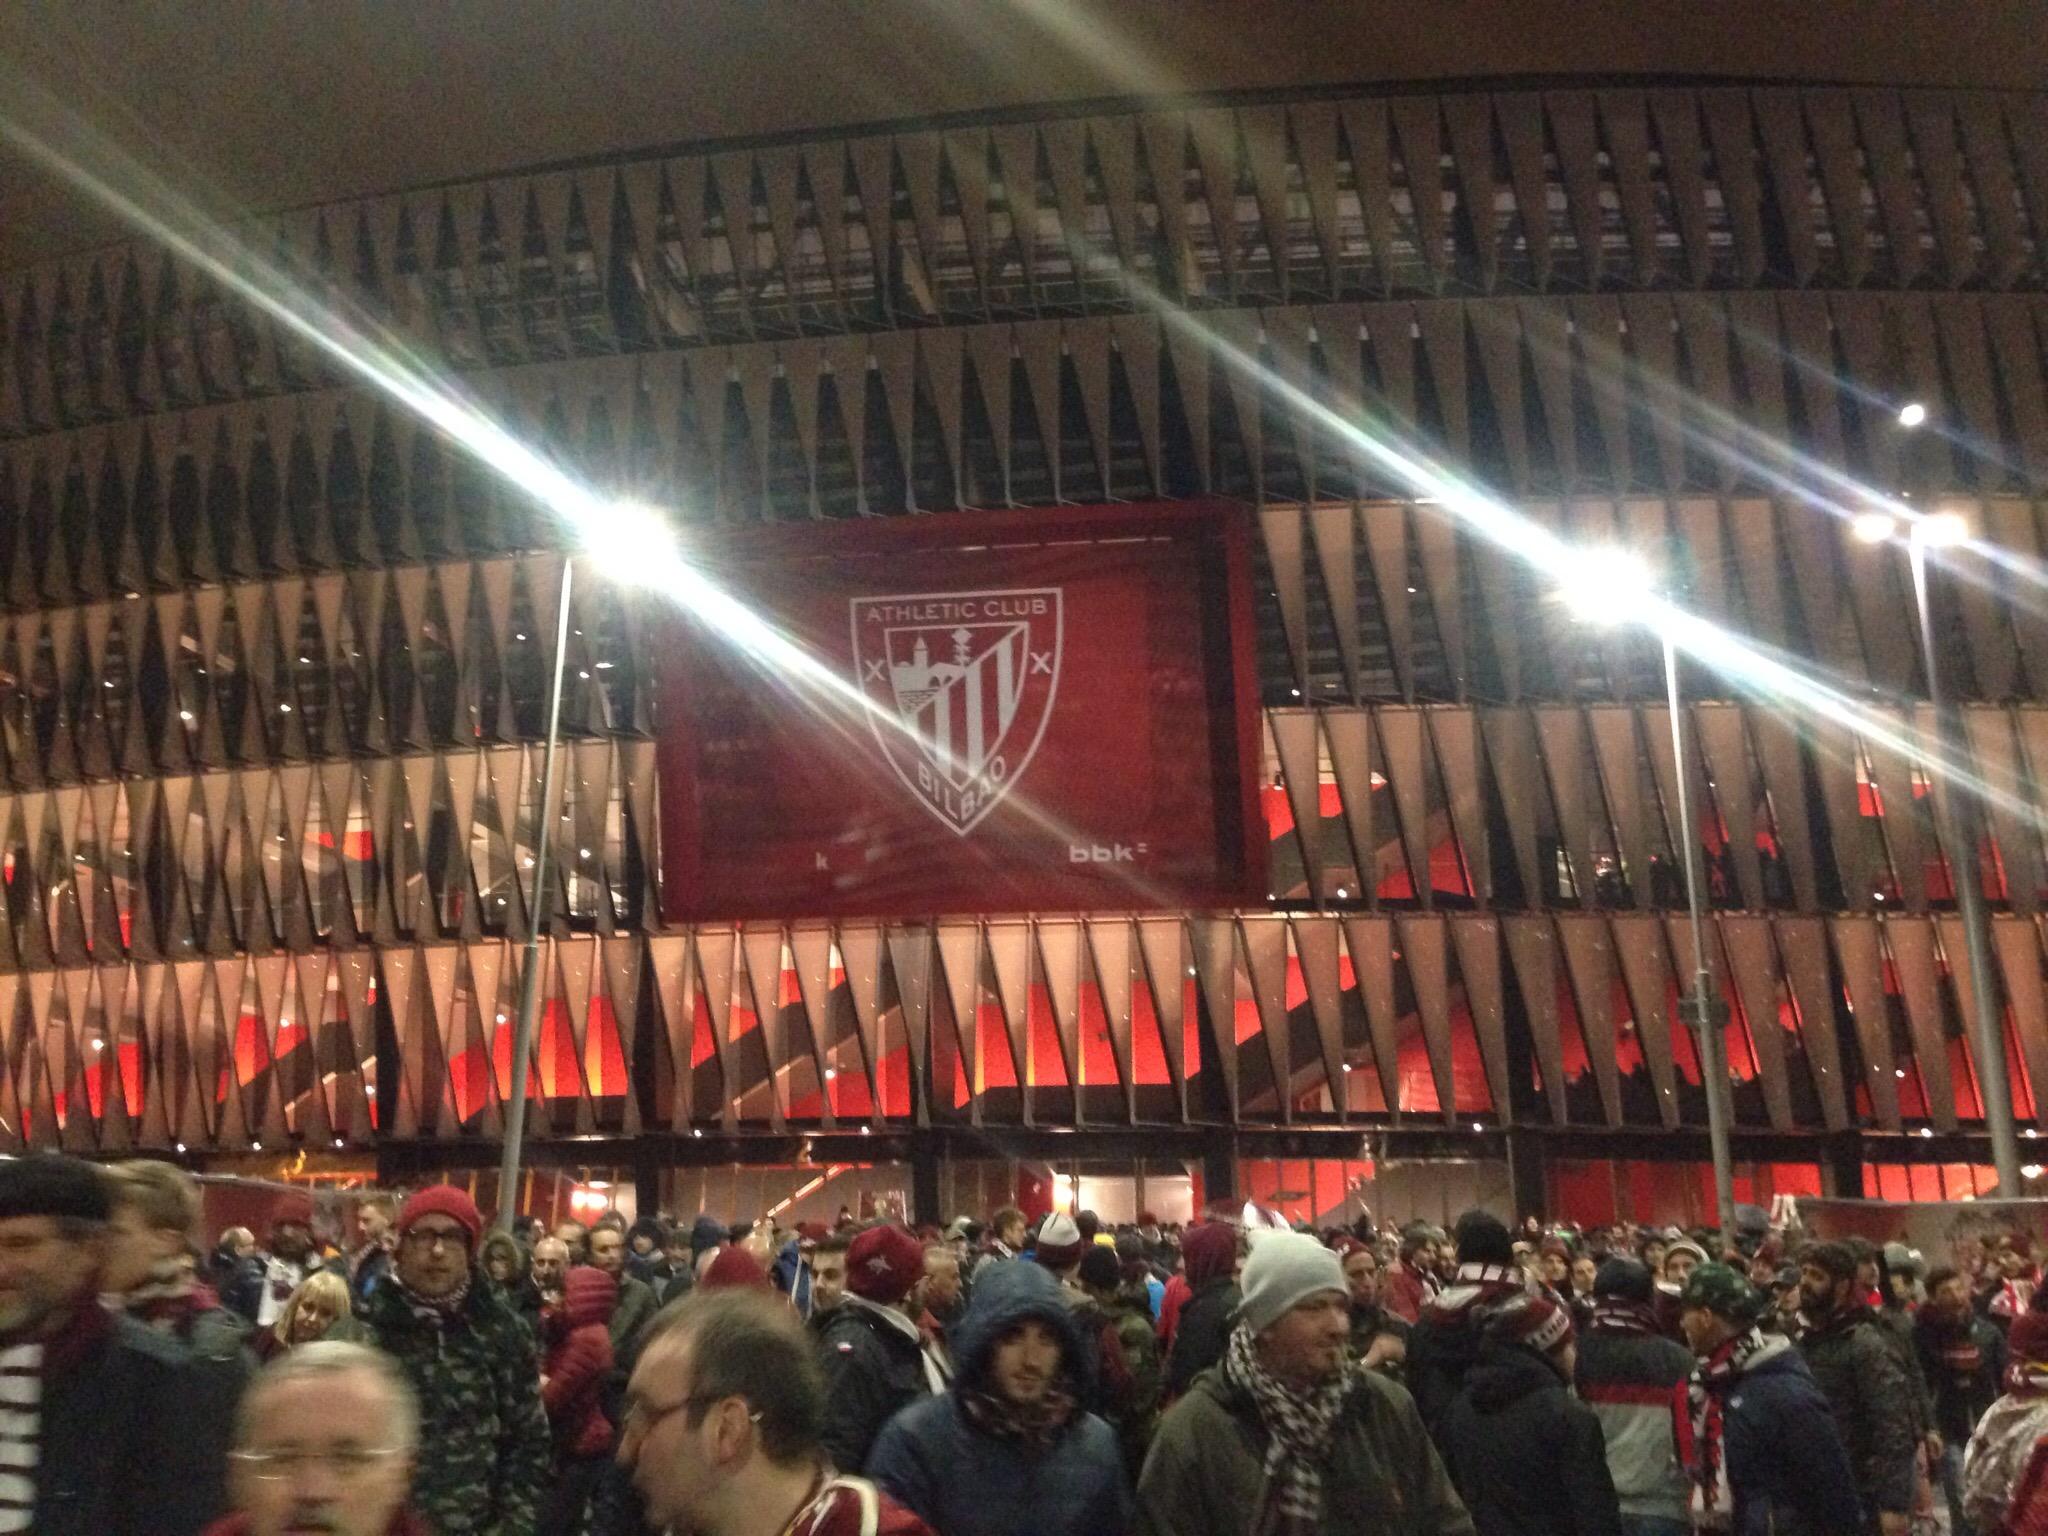 Bilbao calling a/r